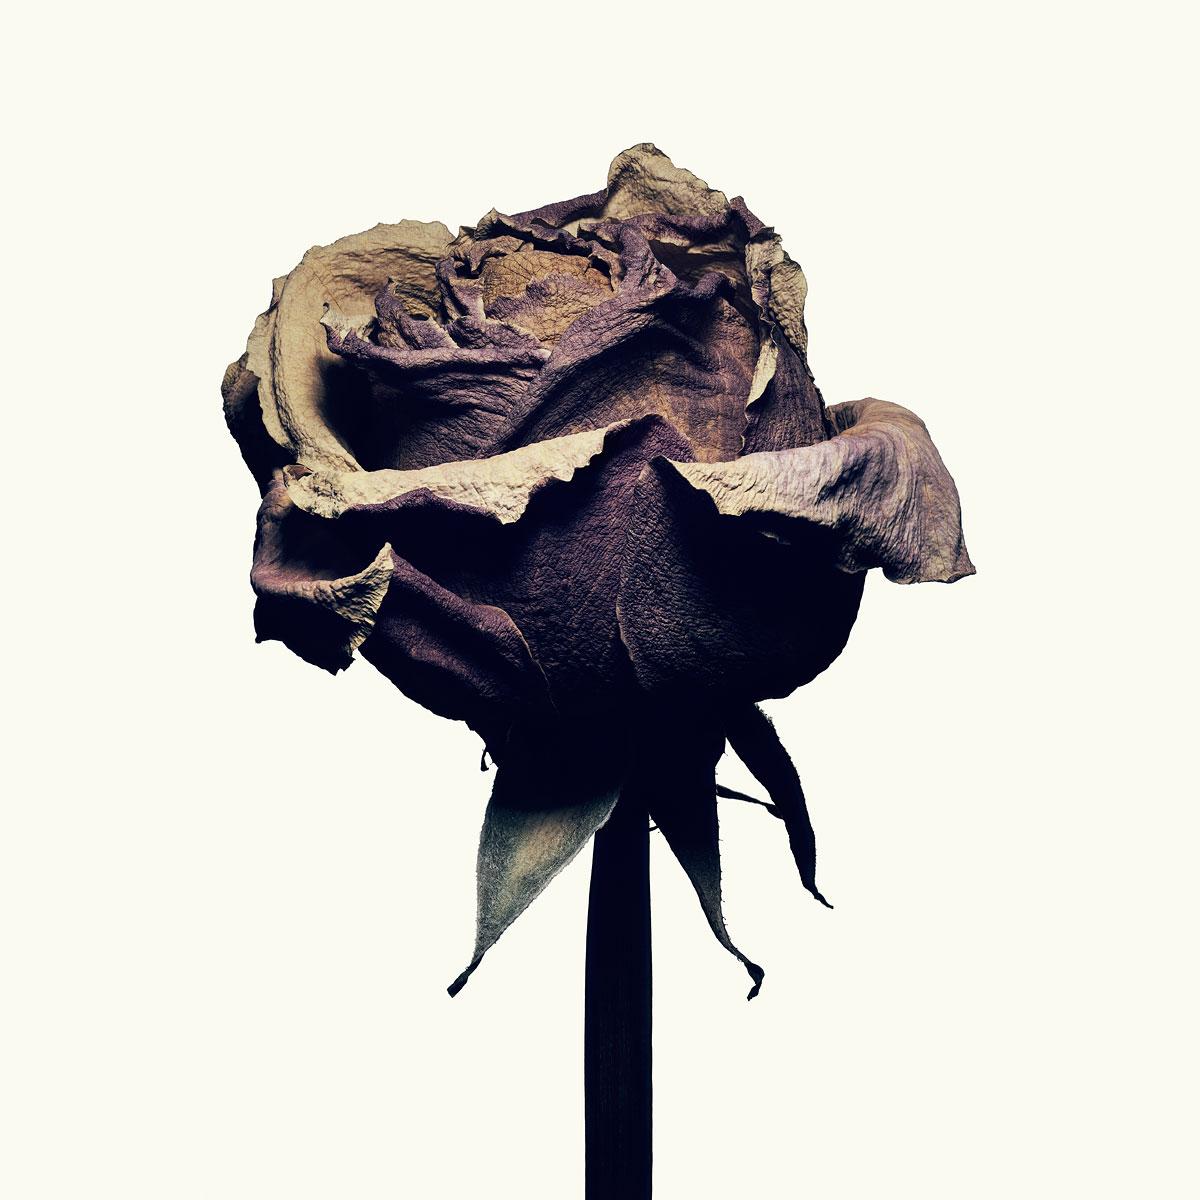 Plate 01_Rose #1